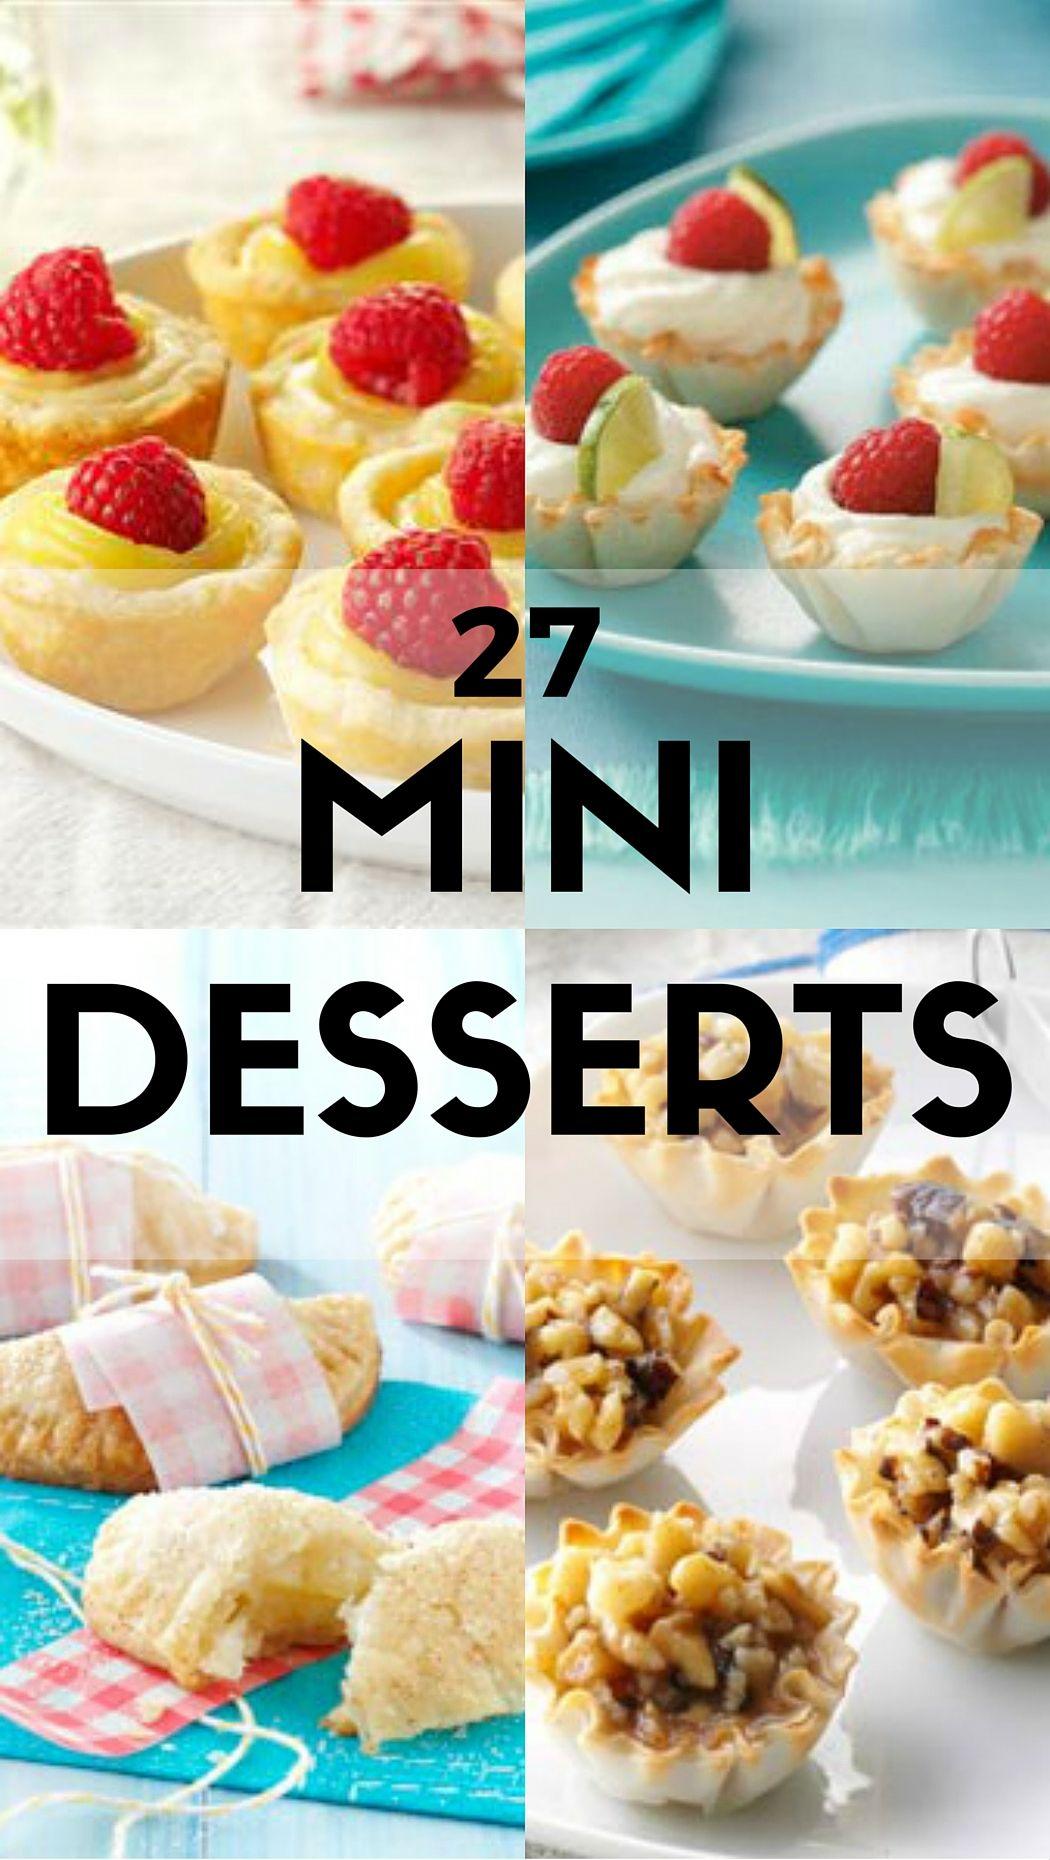 5 Best Skinny Mini Dessert Recipes recommendations